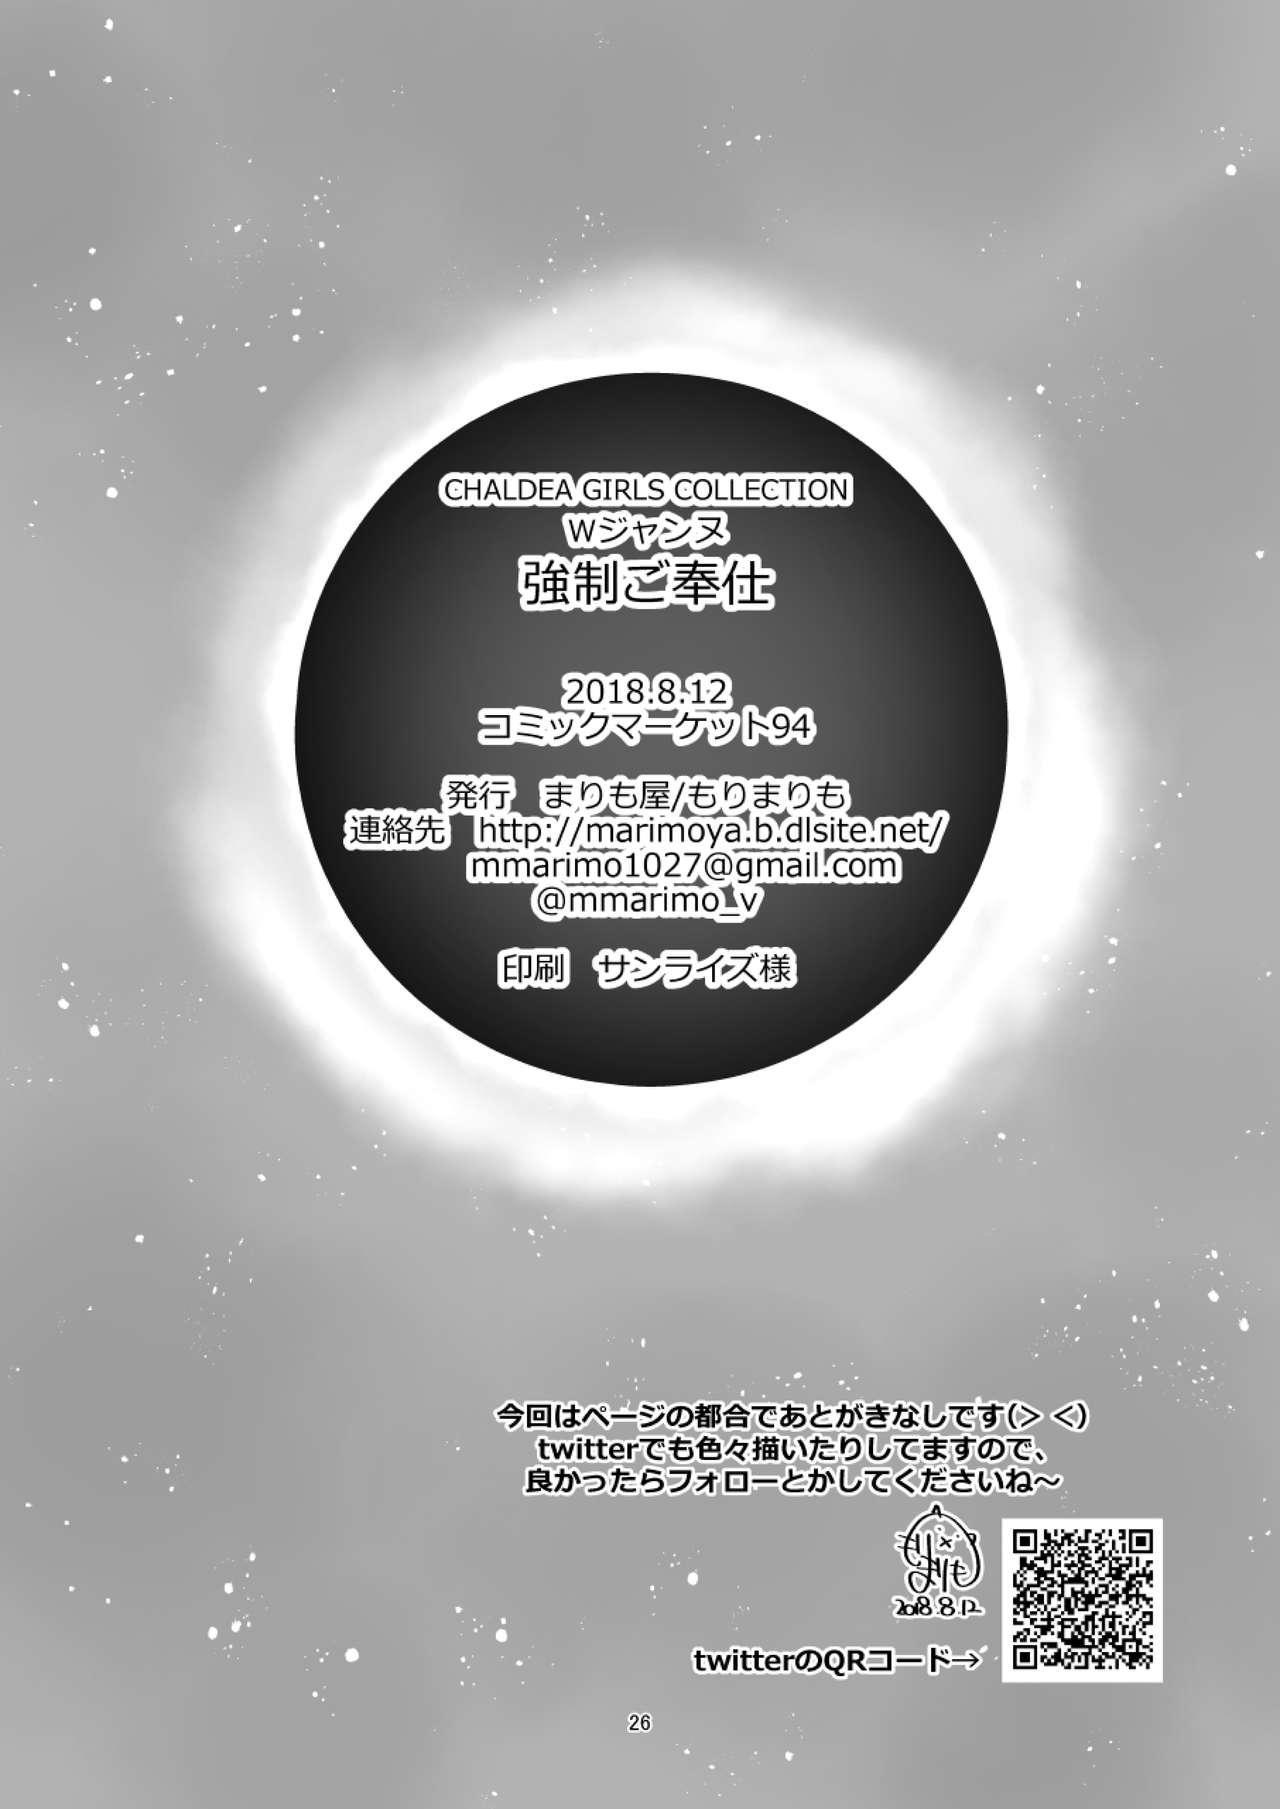 Chaldea Girls Collection W Jeanne Kyousei Gohoushi 25